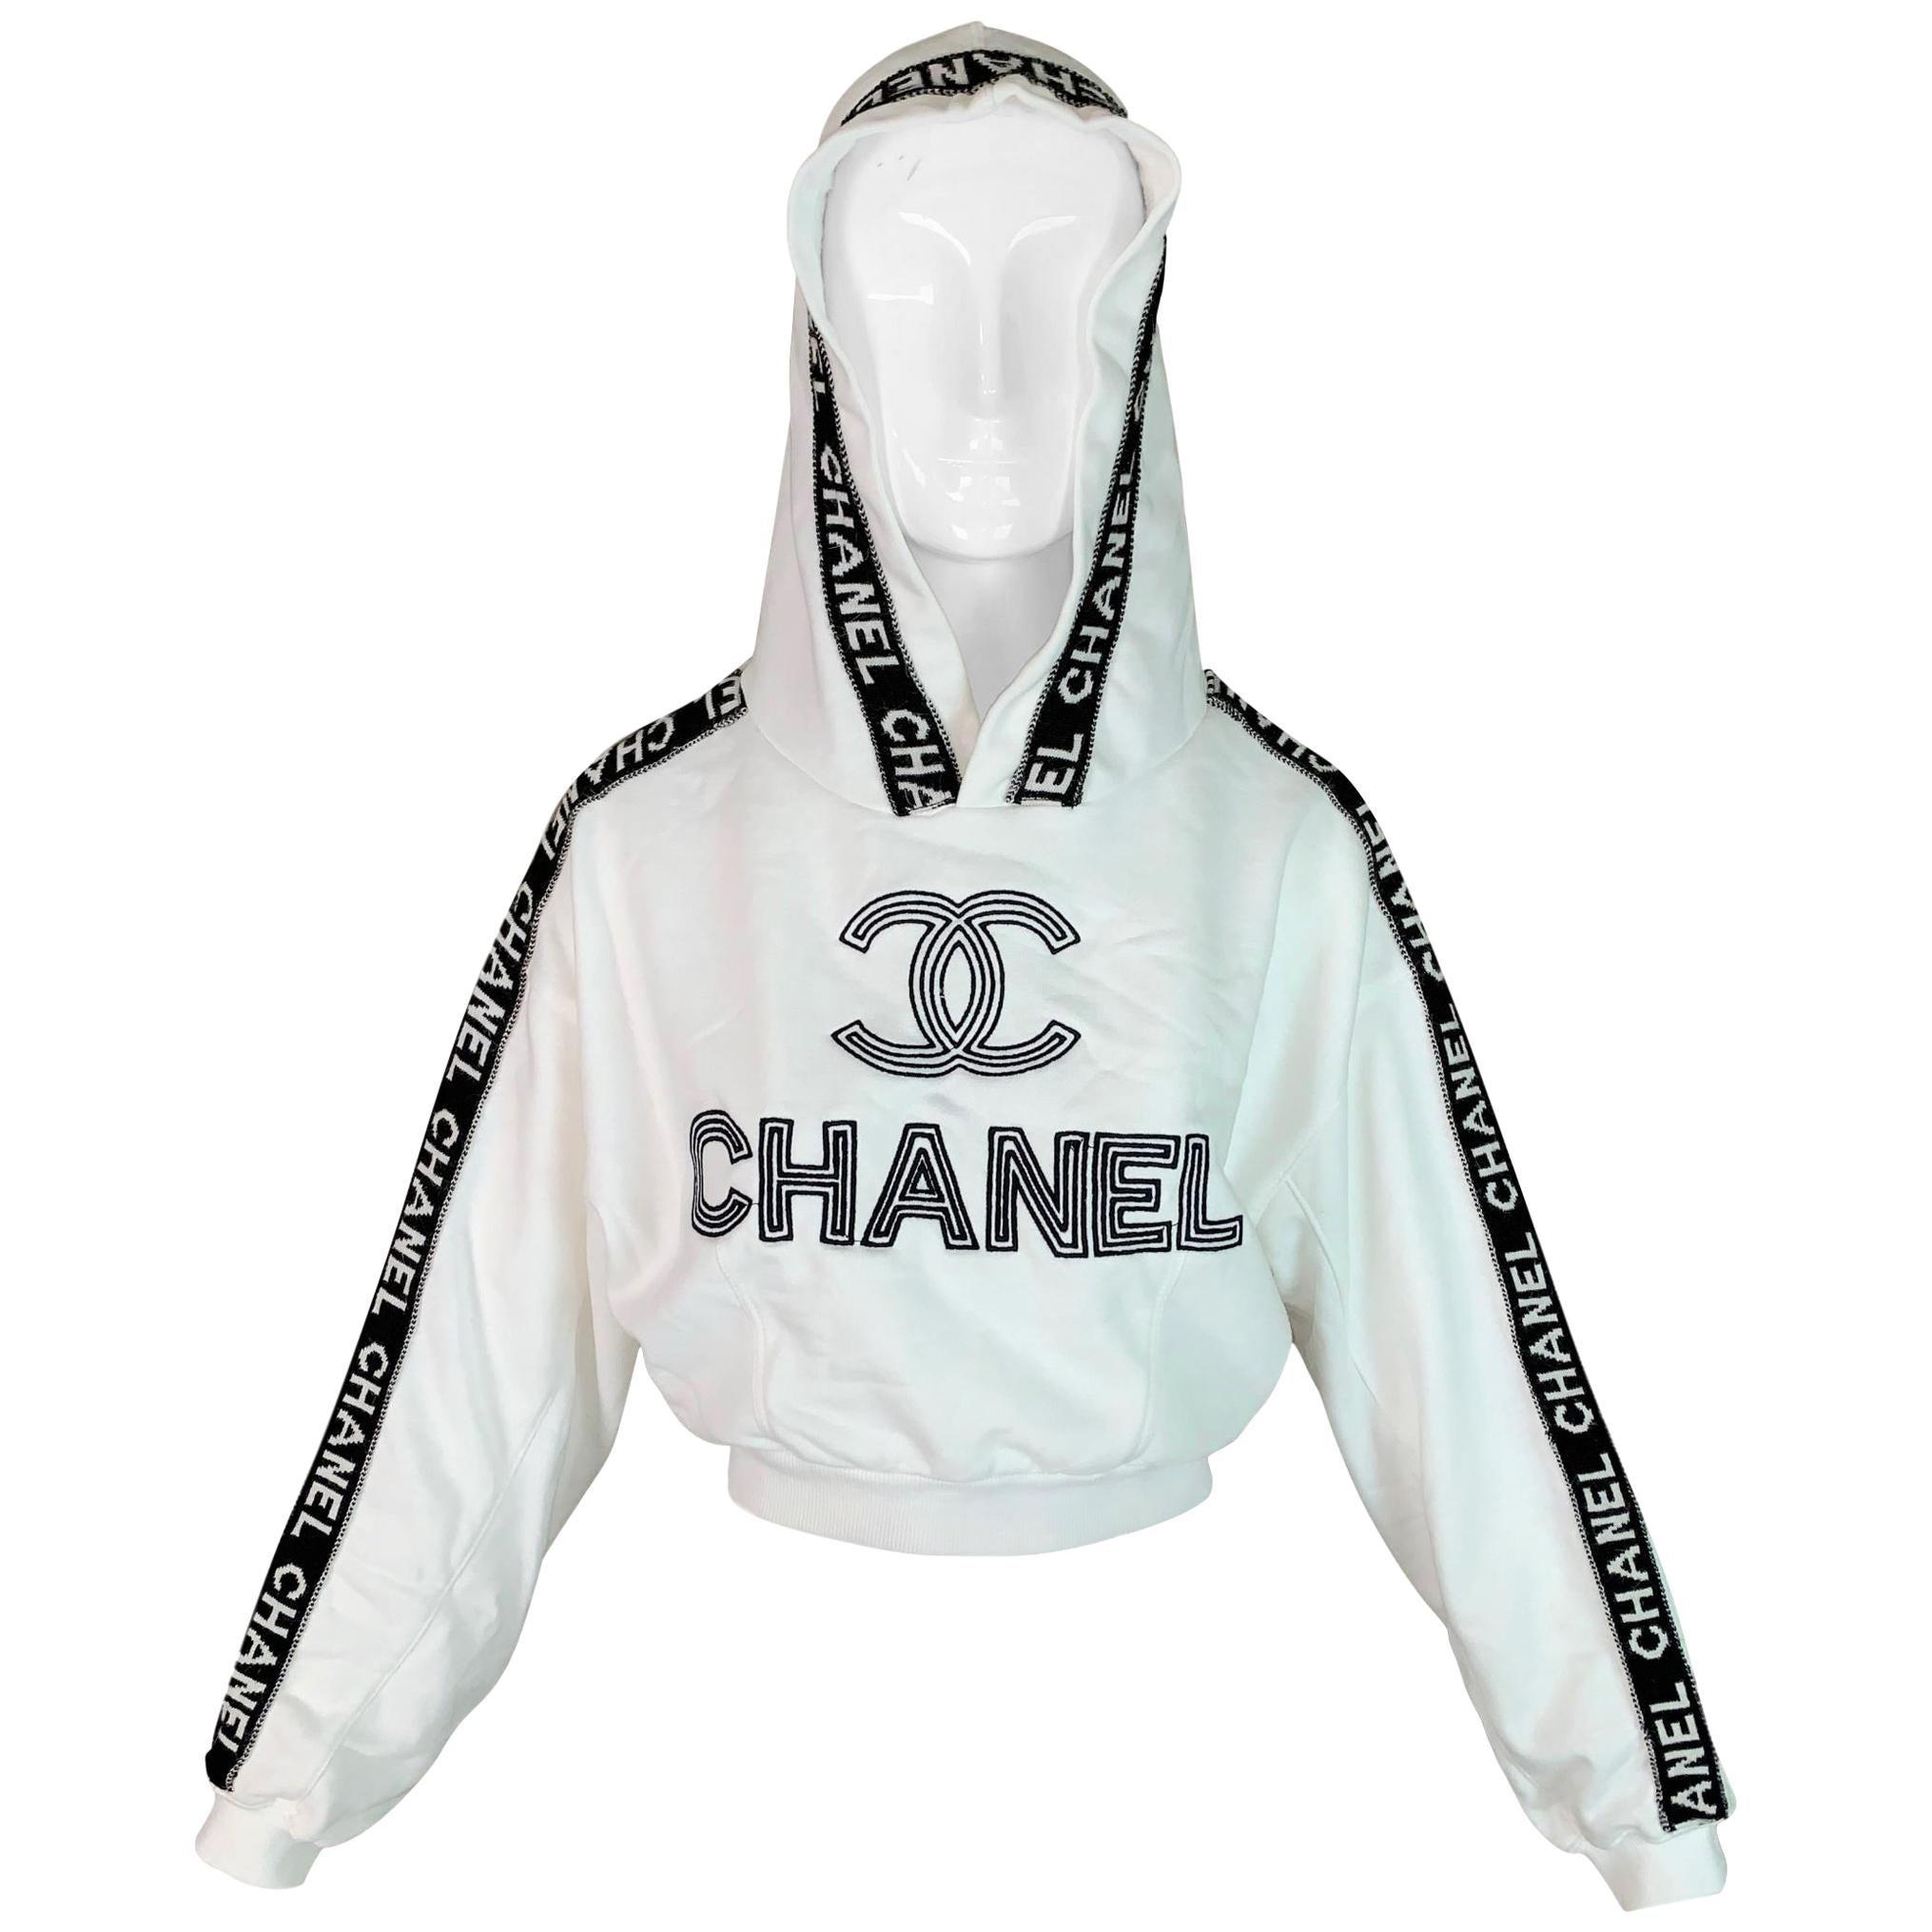 F/W 1994 Chanel White Logo Cropped Hoodie Sweatshirt